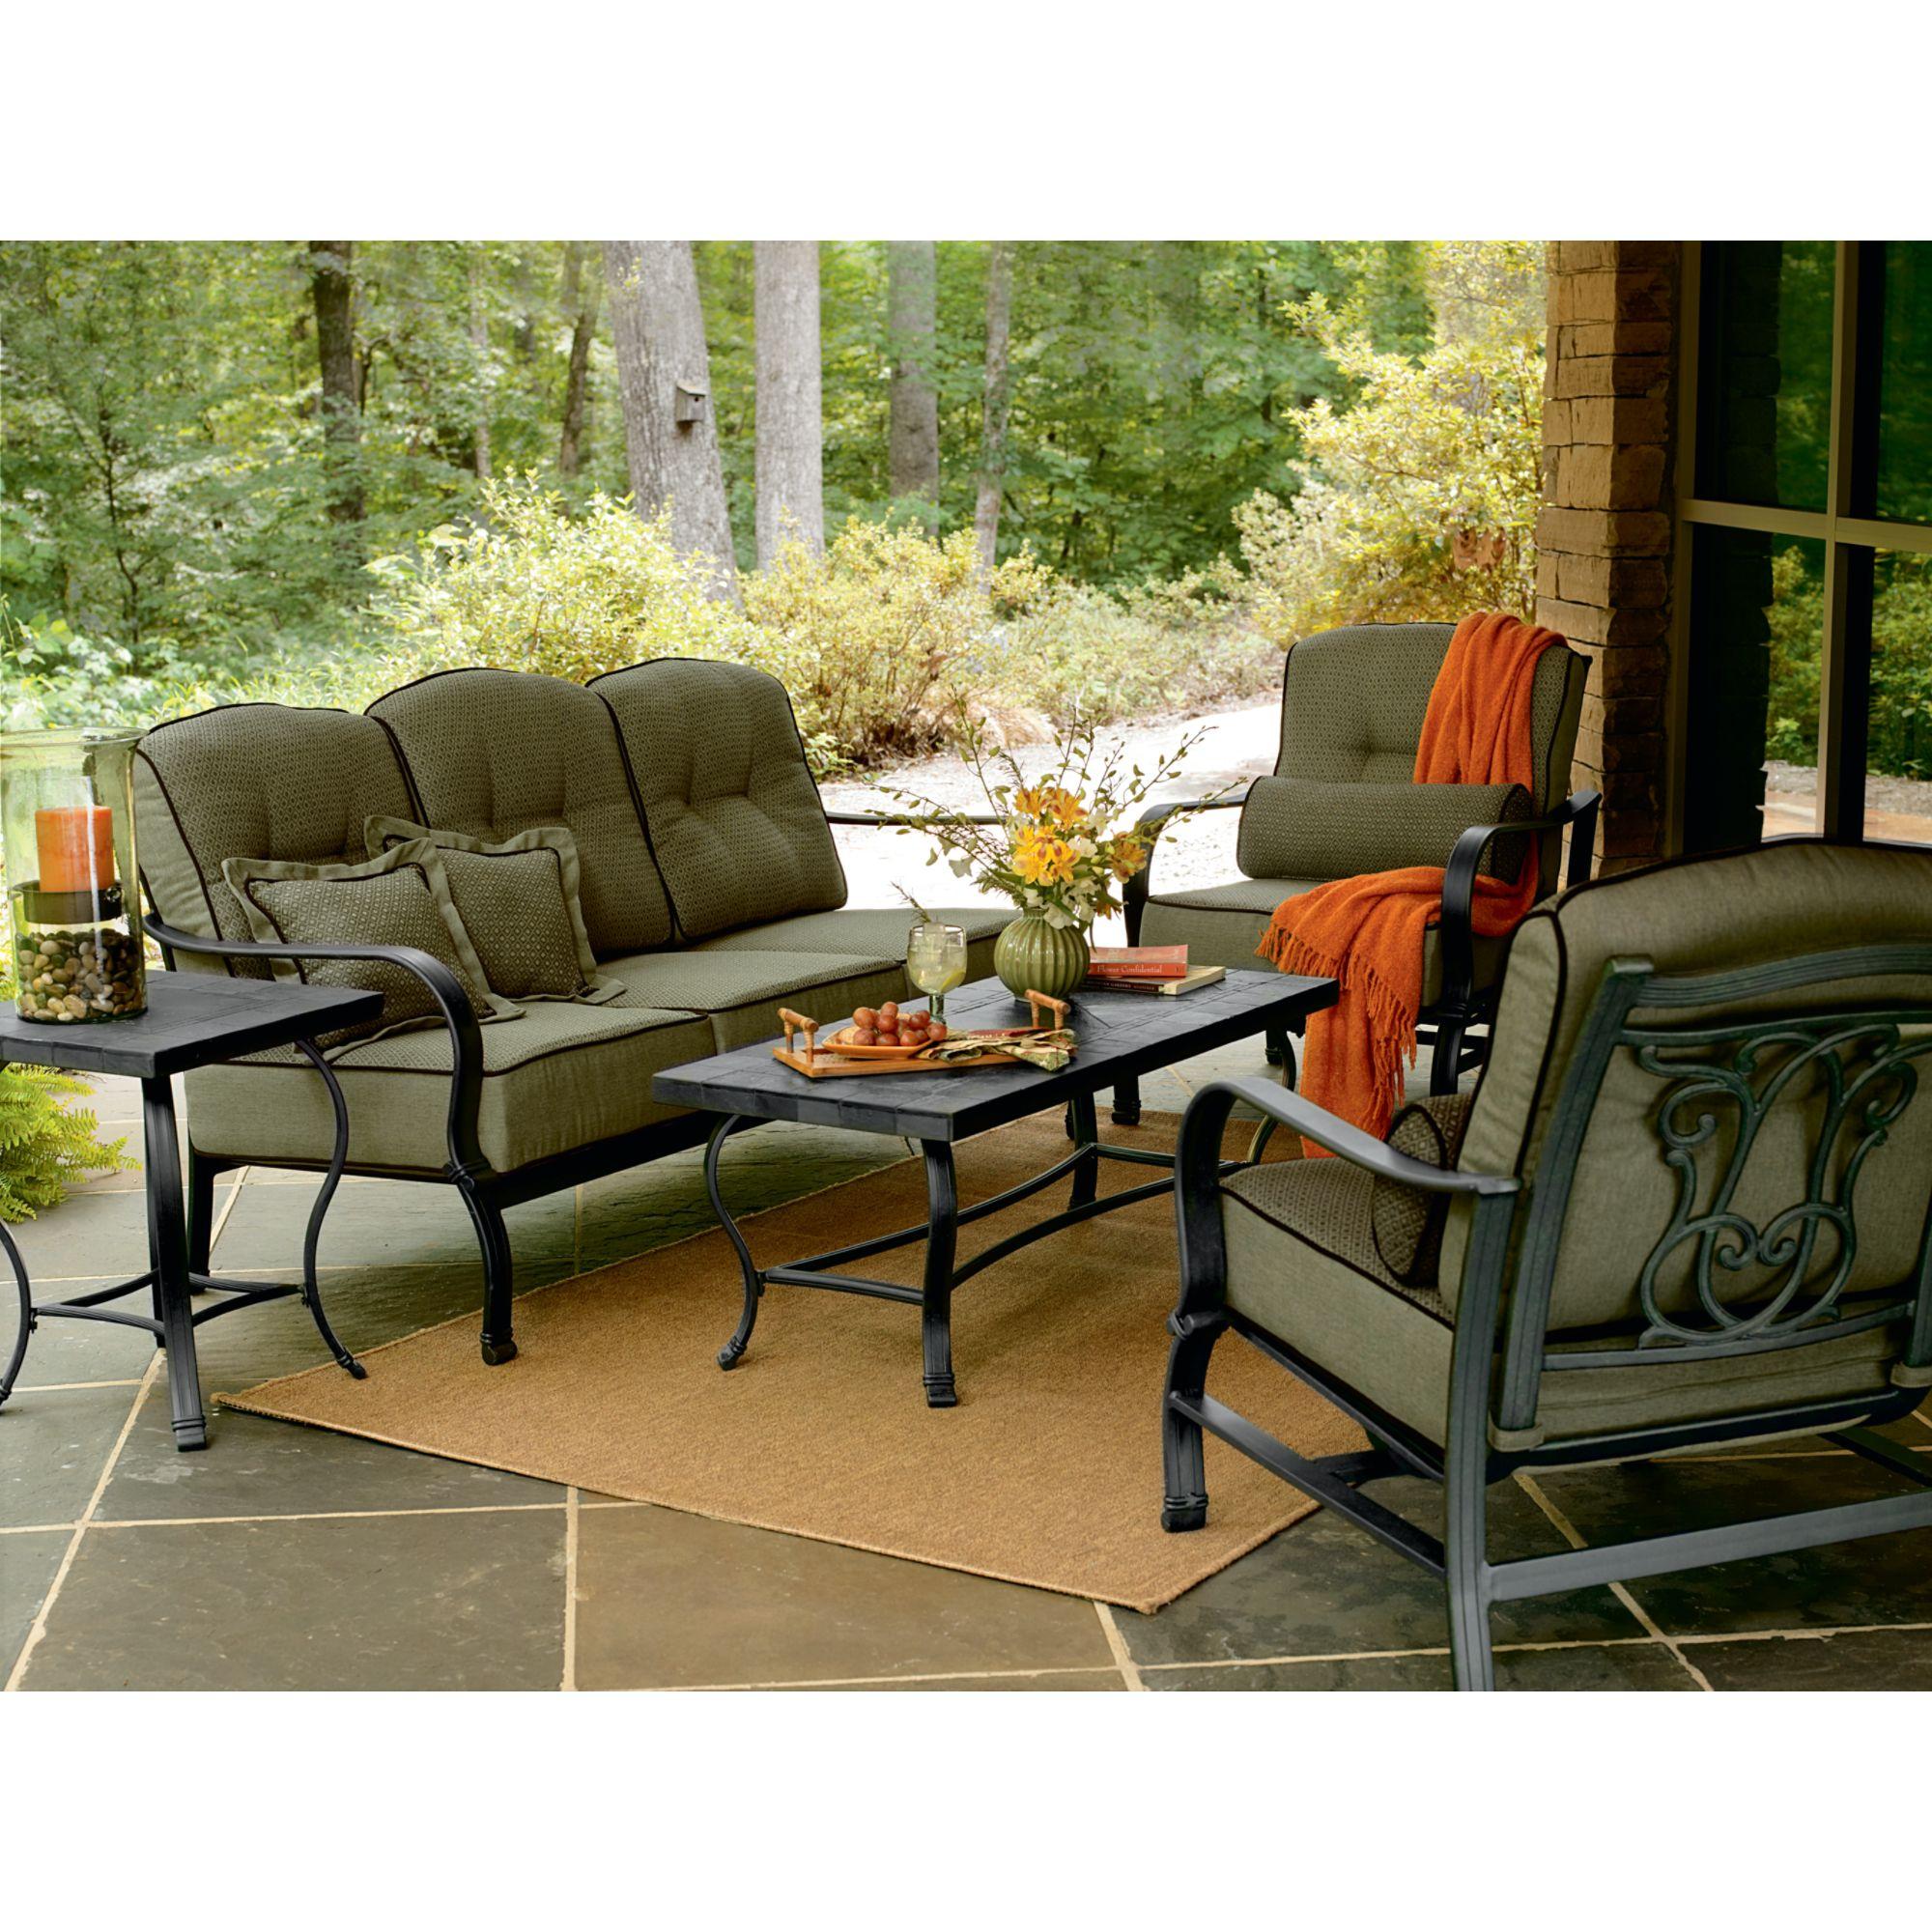 Elegant Lazboy Outdoor Furniture Lavishly Lazy Boy Sear in measurements 2000 X 2000